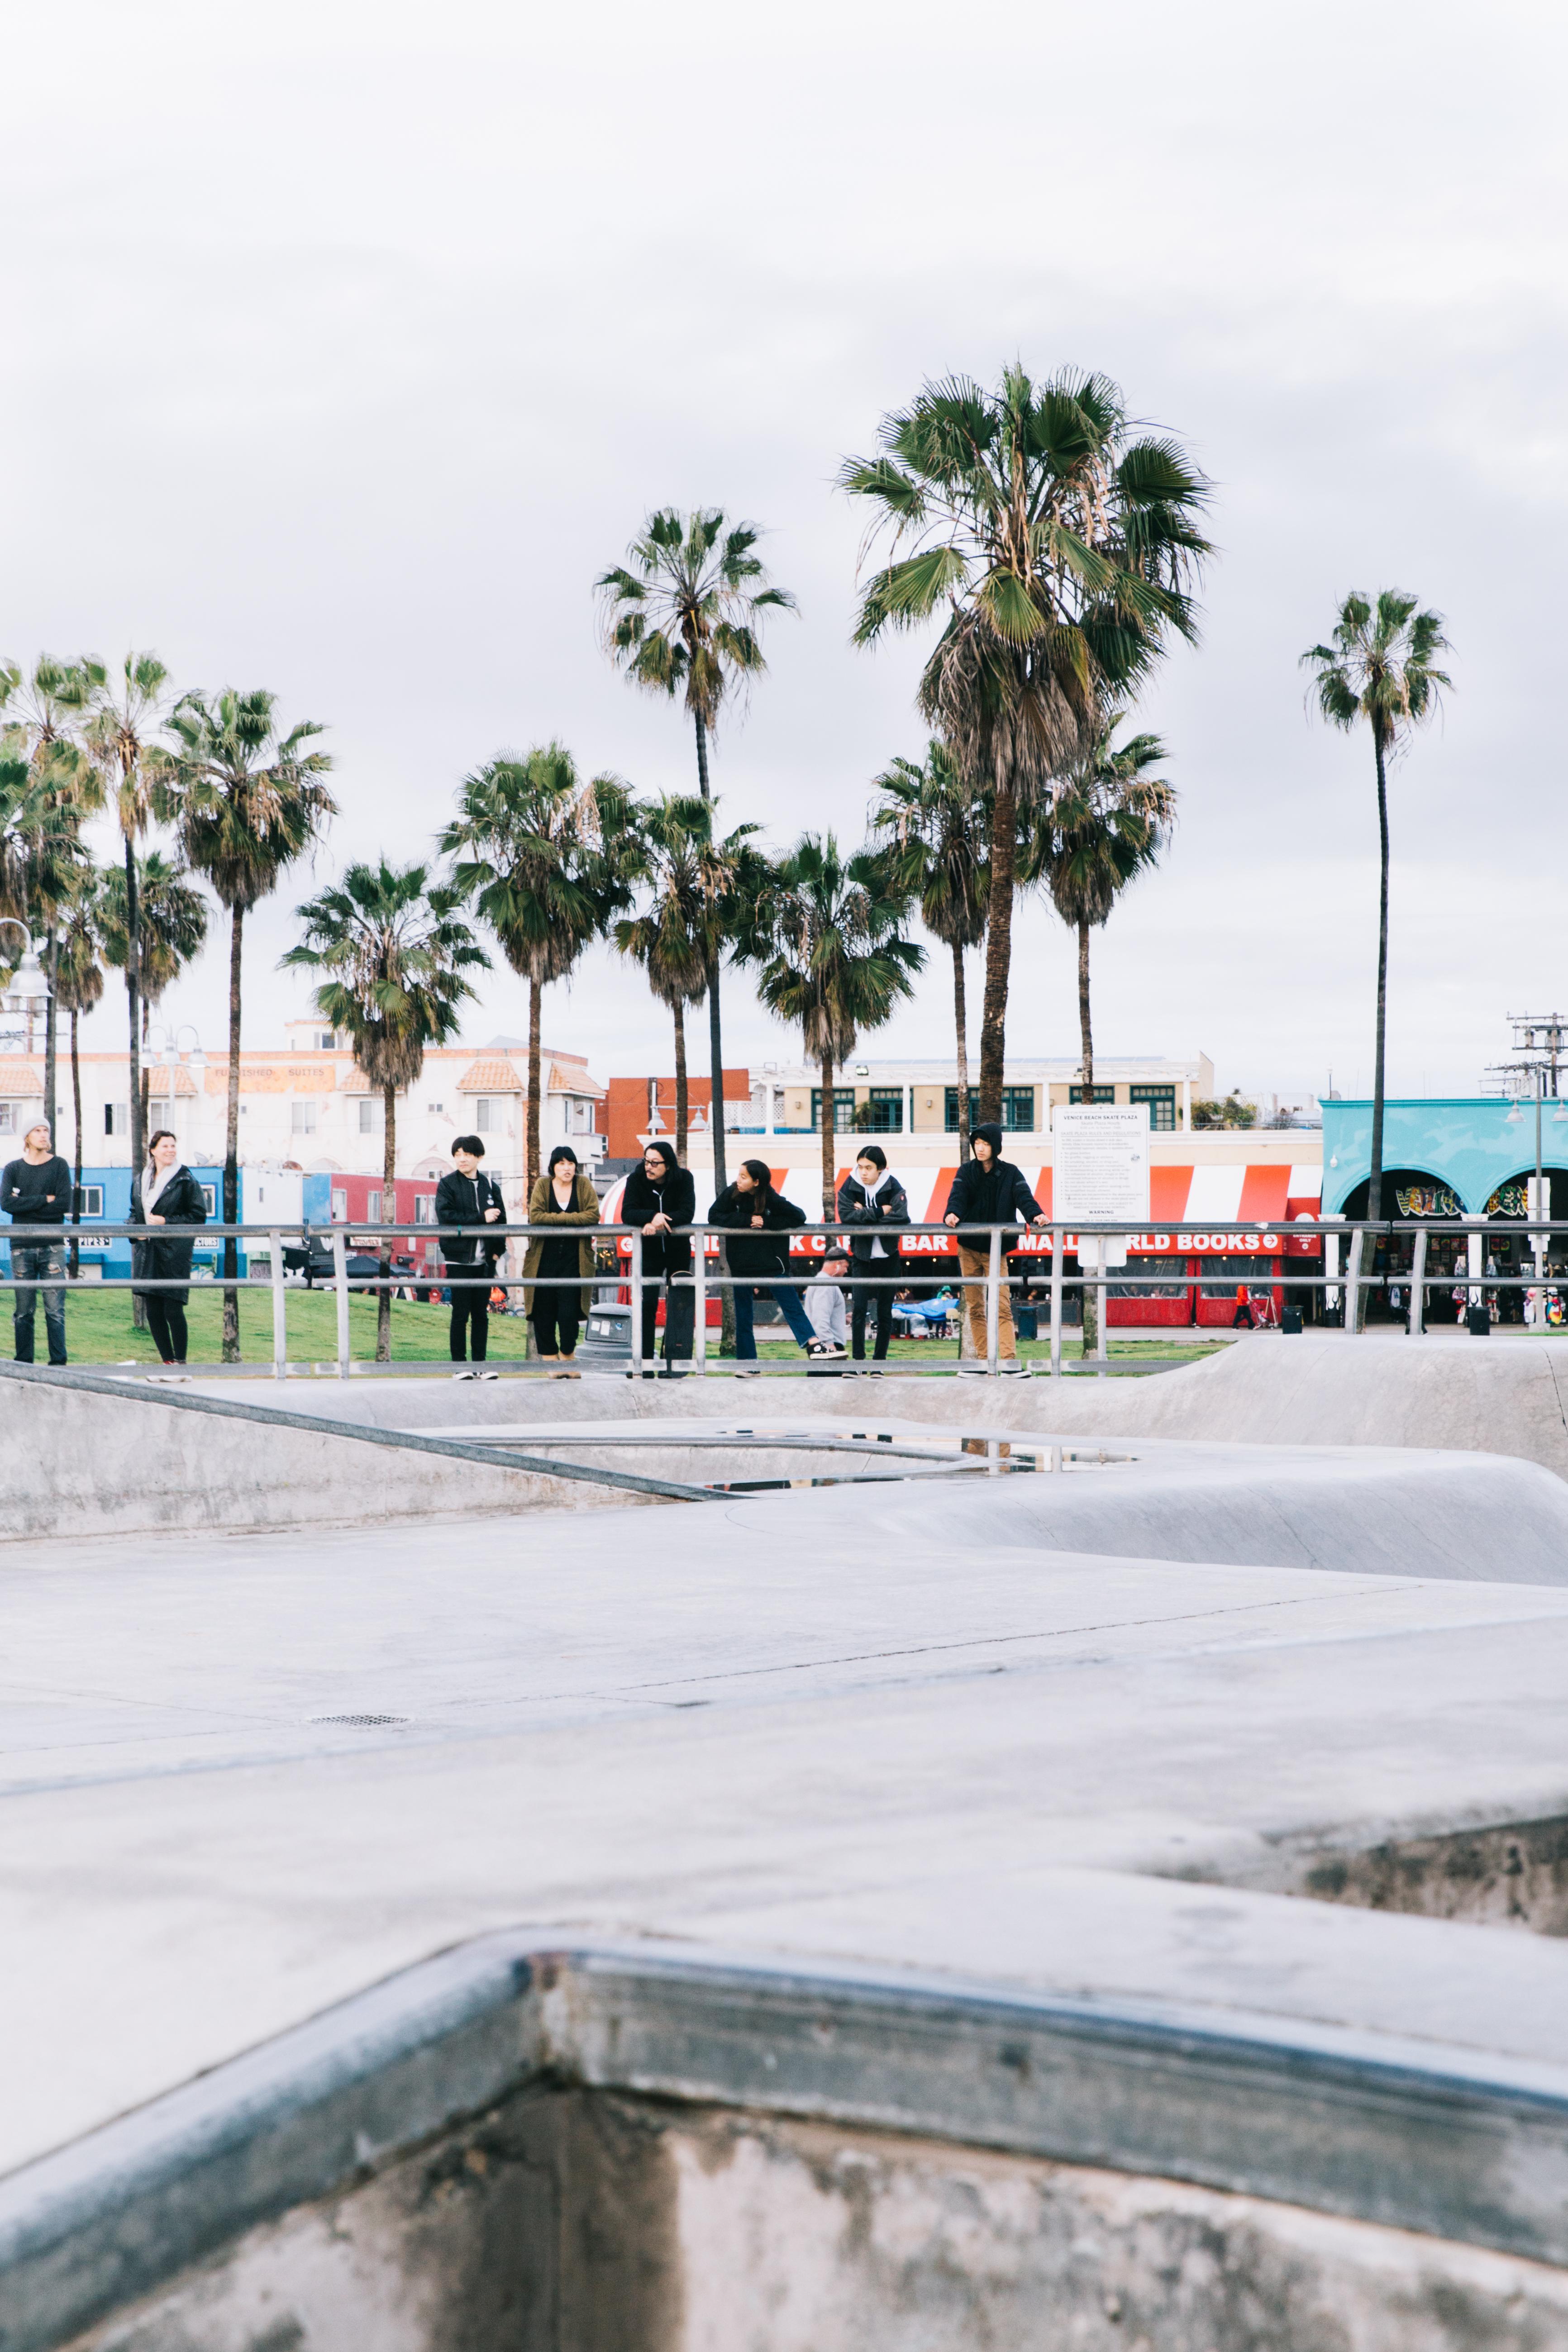 Mégane Arderighi - Venice Beach Los Angeles